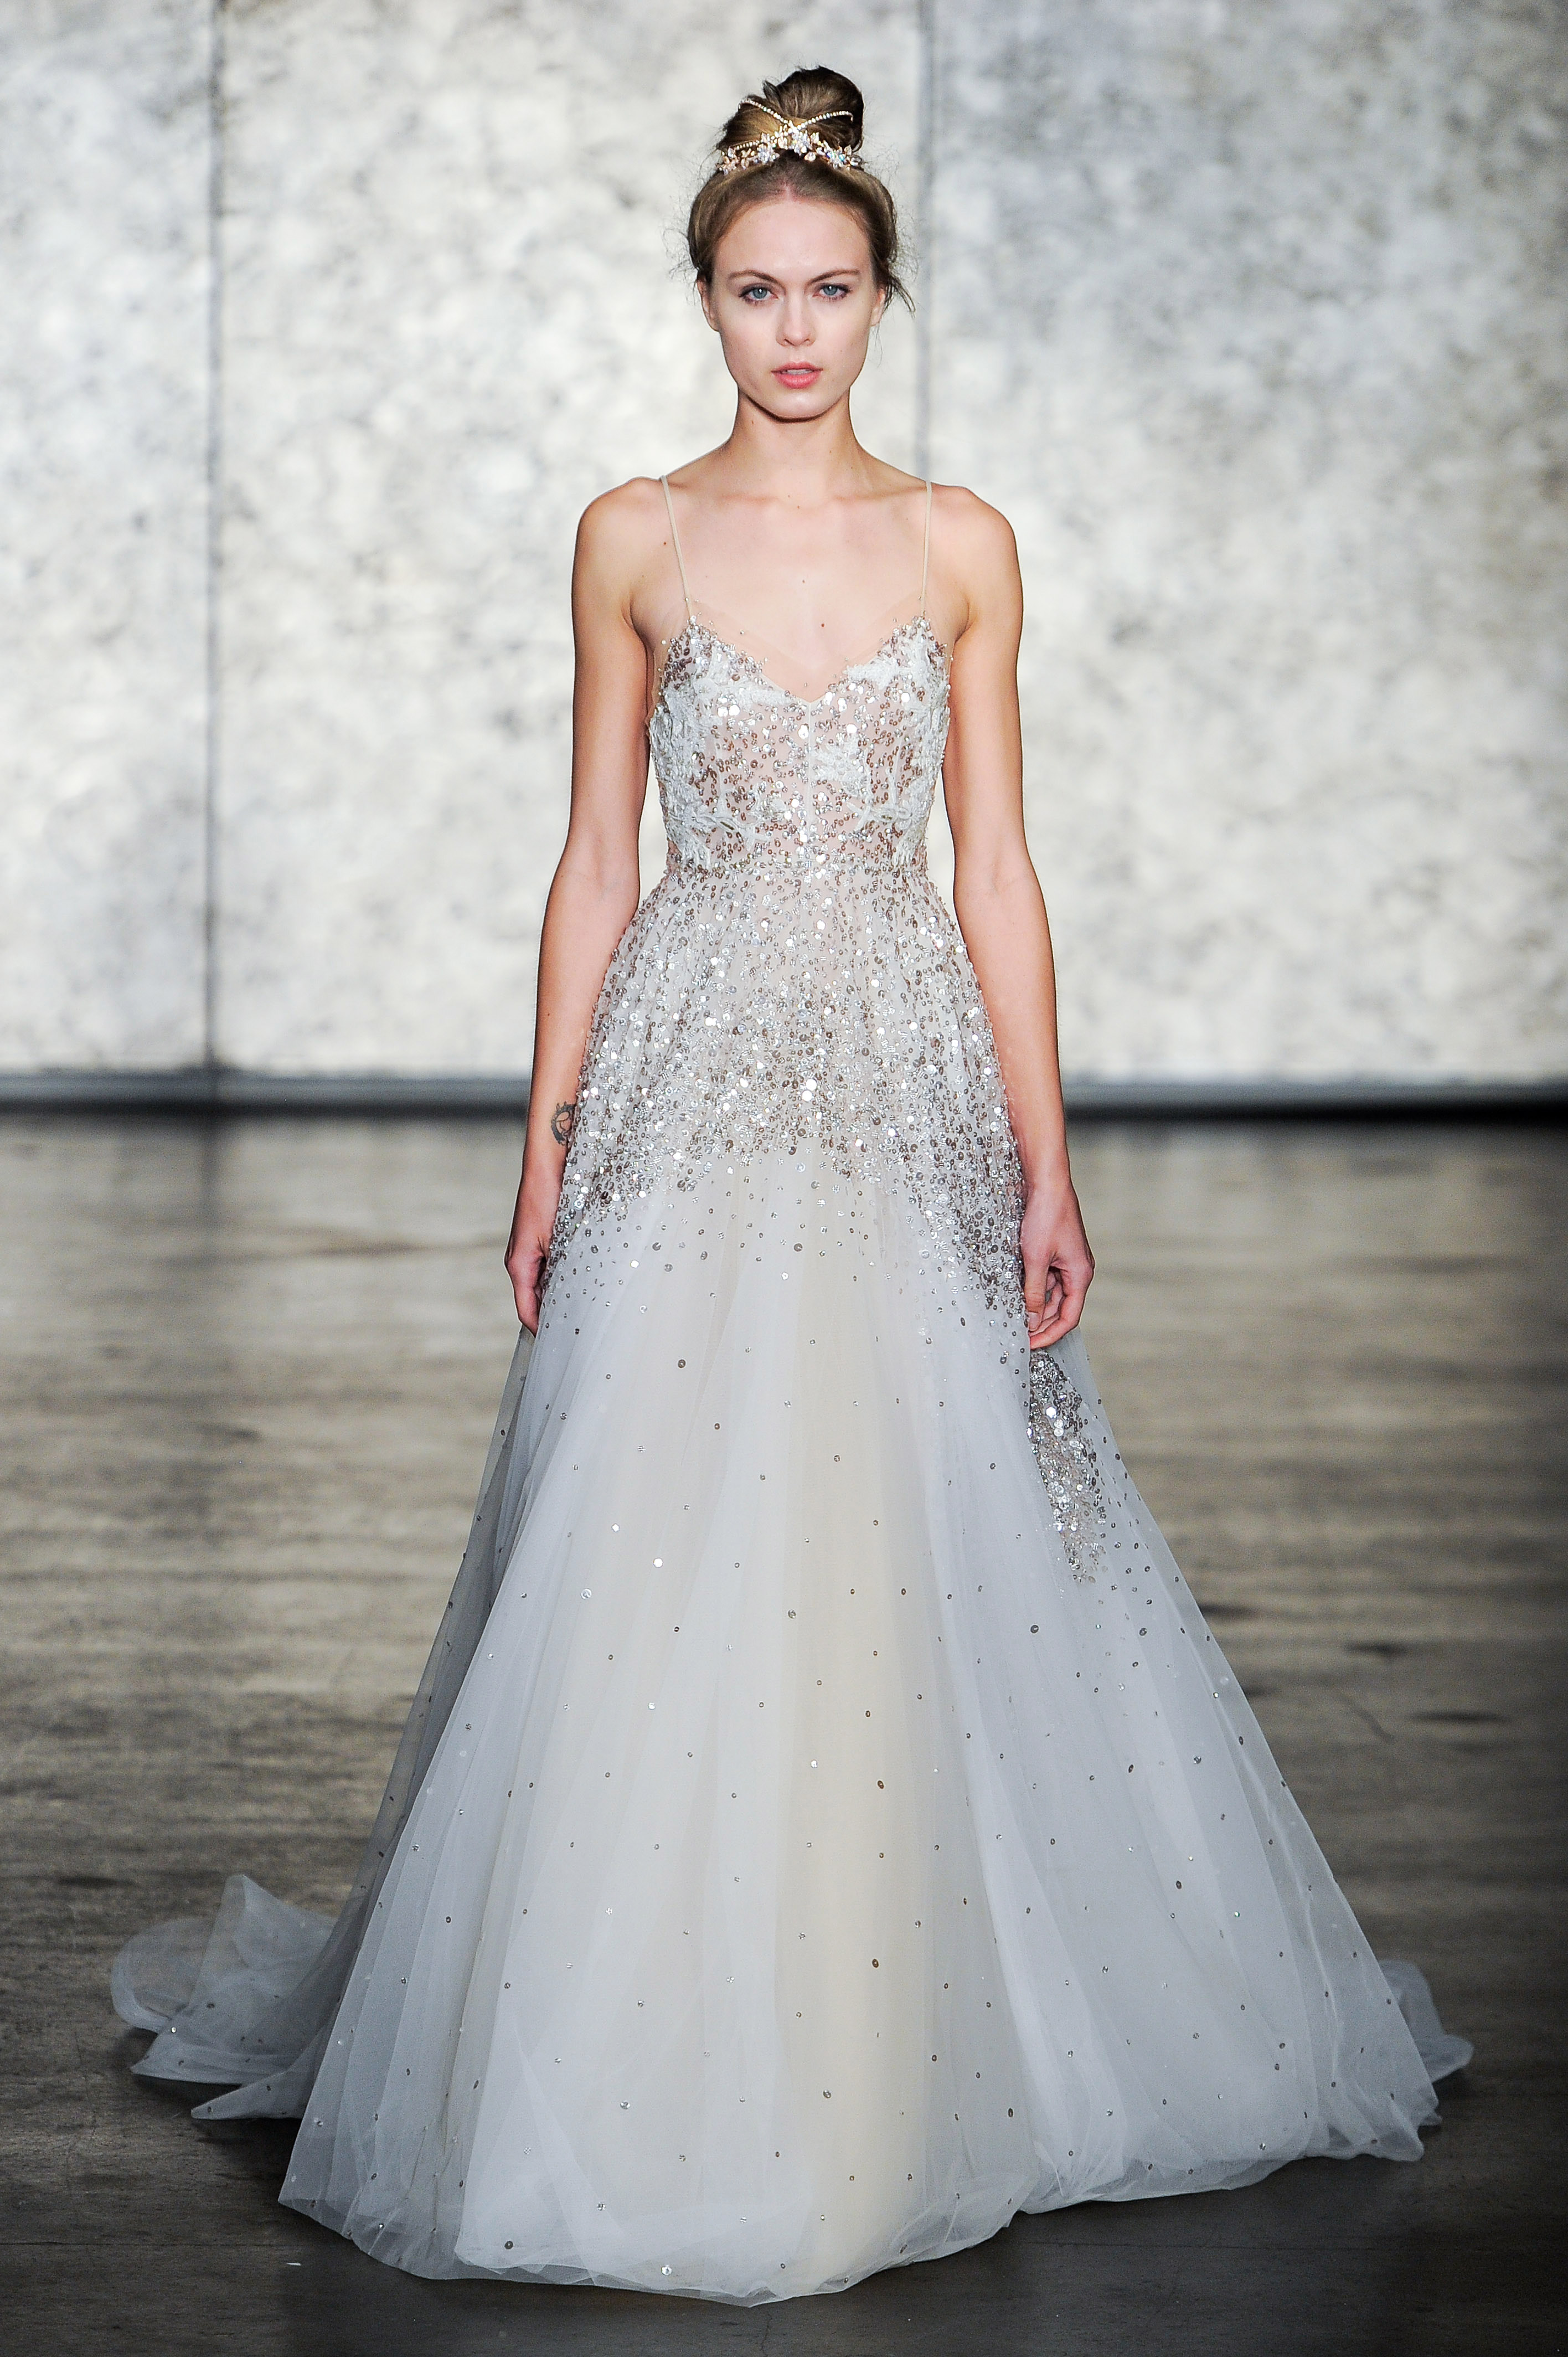 inbal dror fall 2018 v-neck spaghetti strap wedding dress